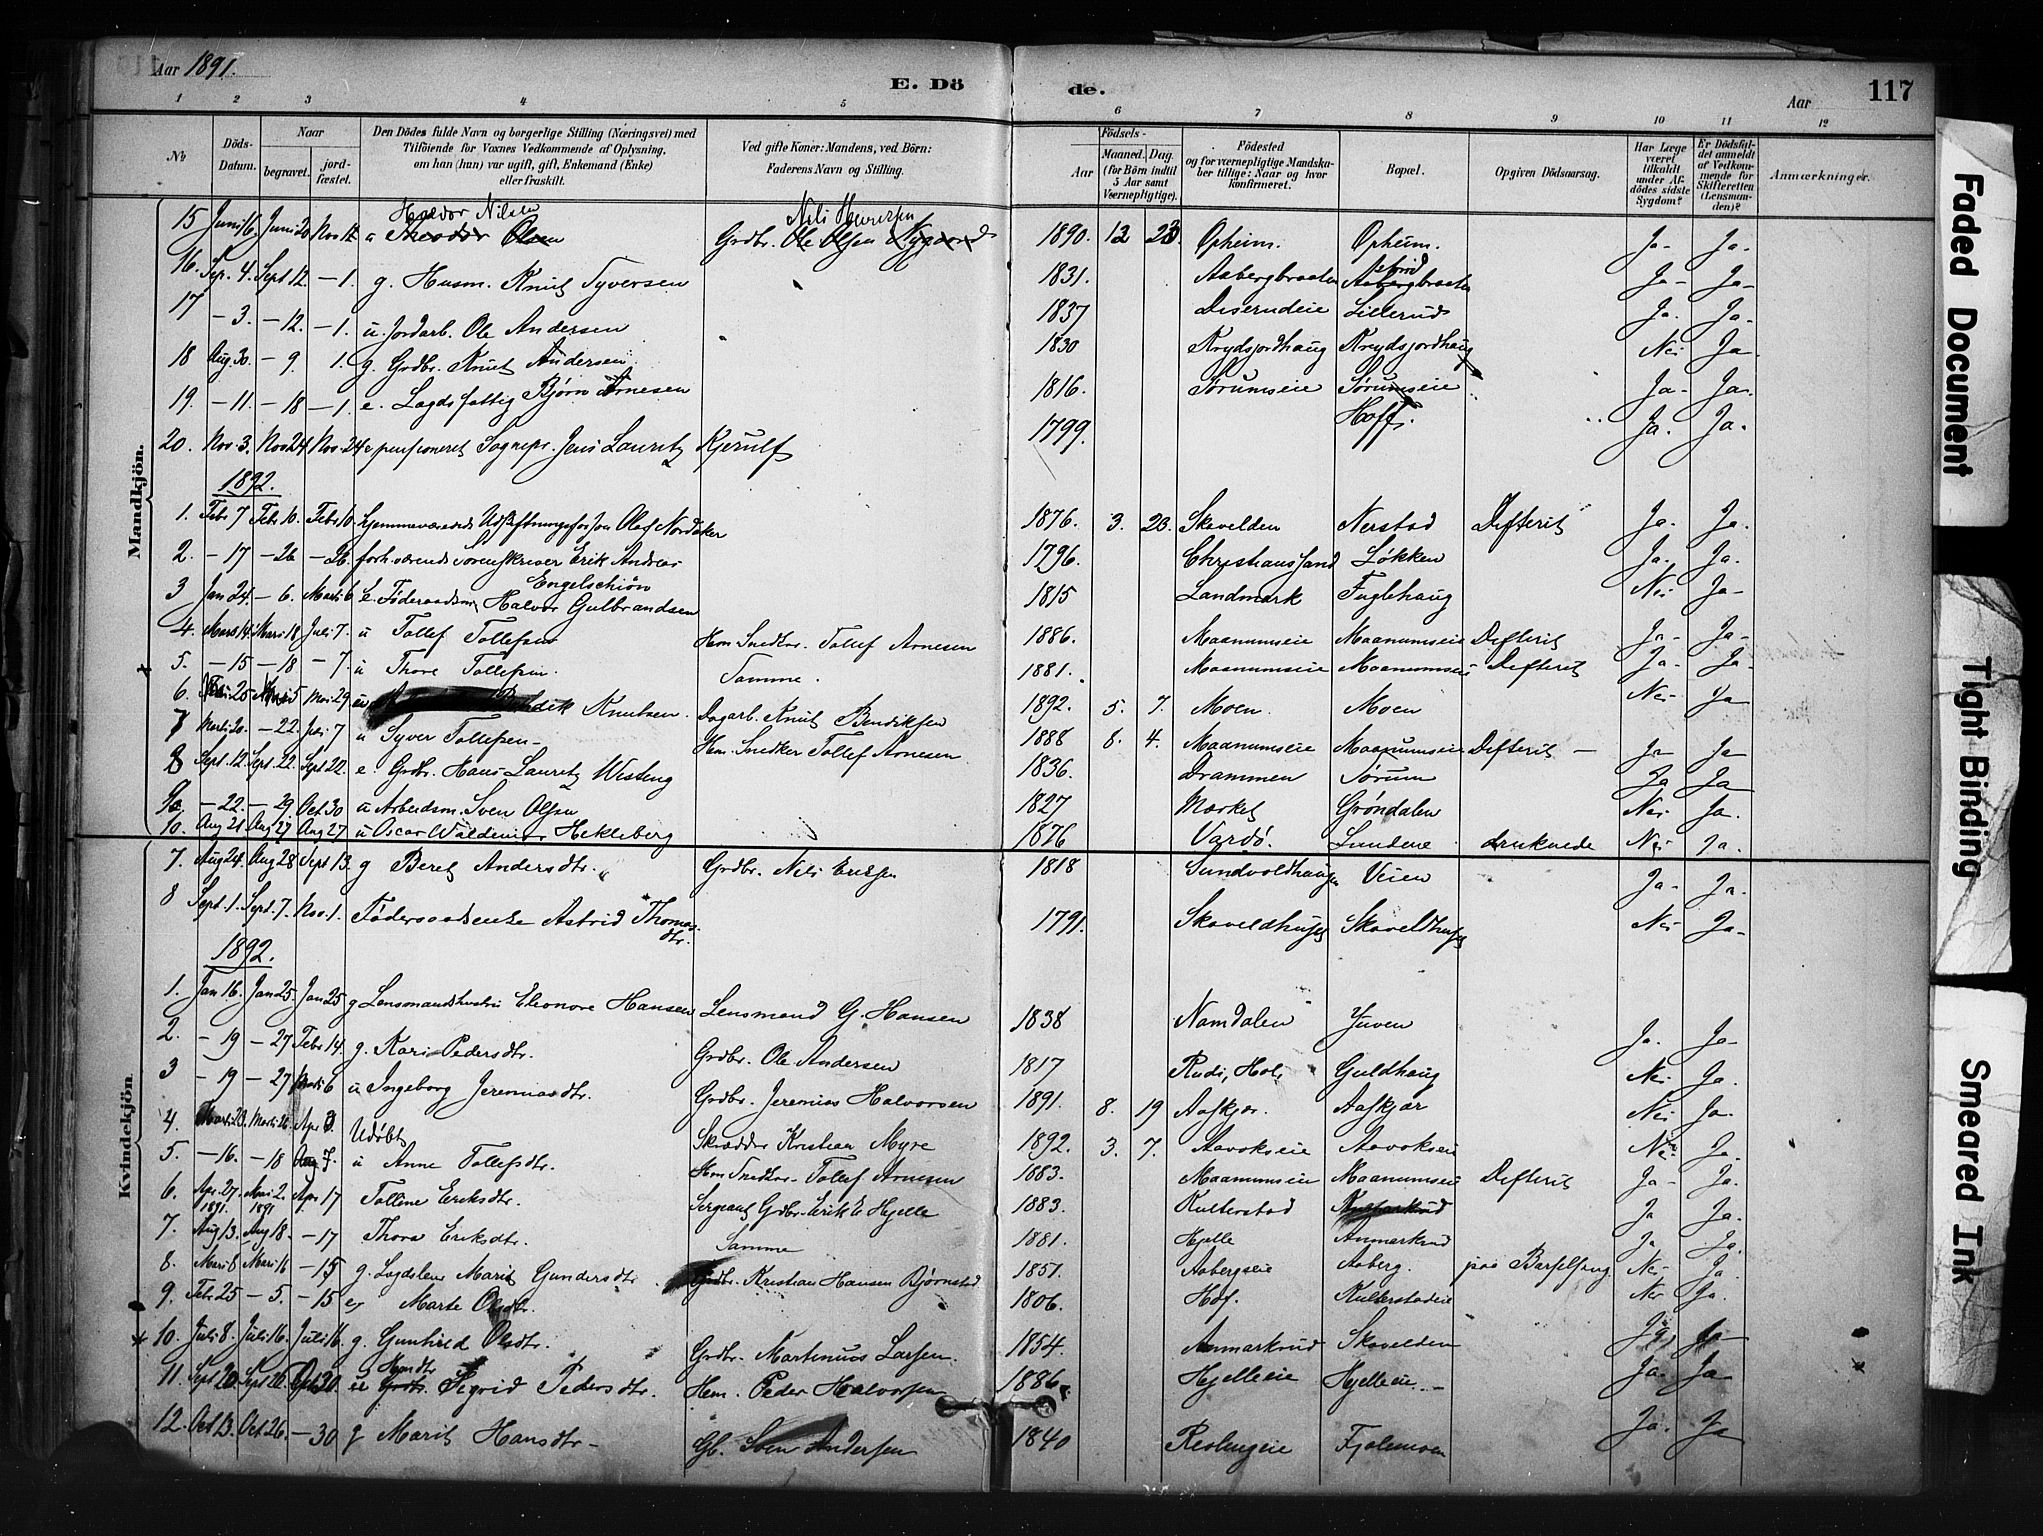 SAH, Nord-Aurdal prestekontor, Ministerialbok nr. 13, 1883-1895, s. 117